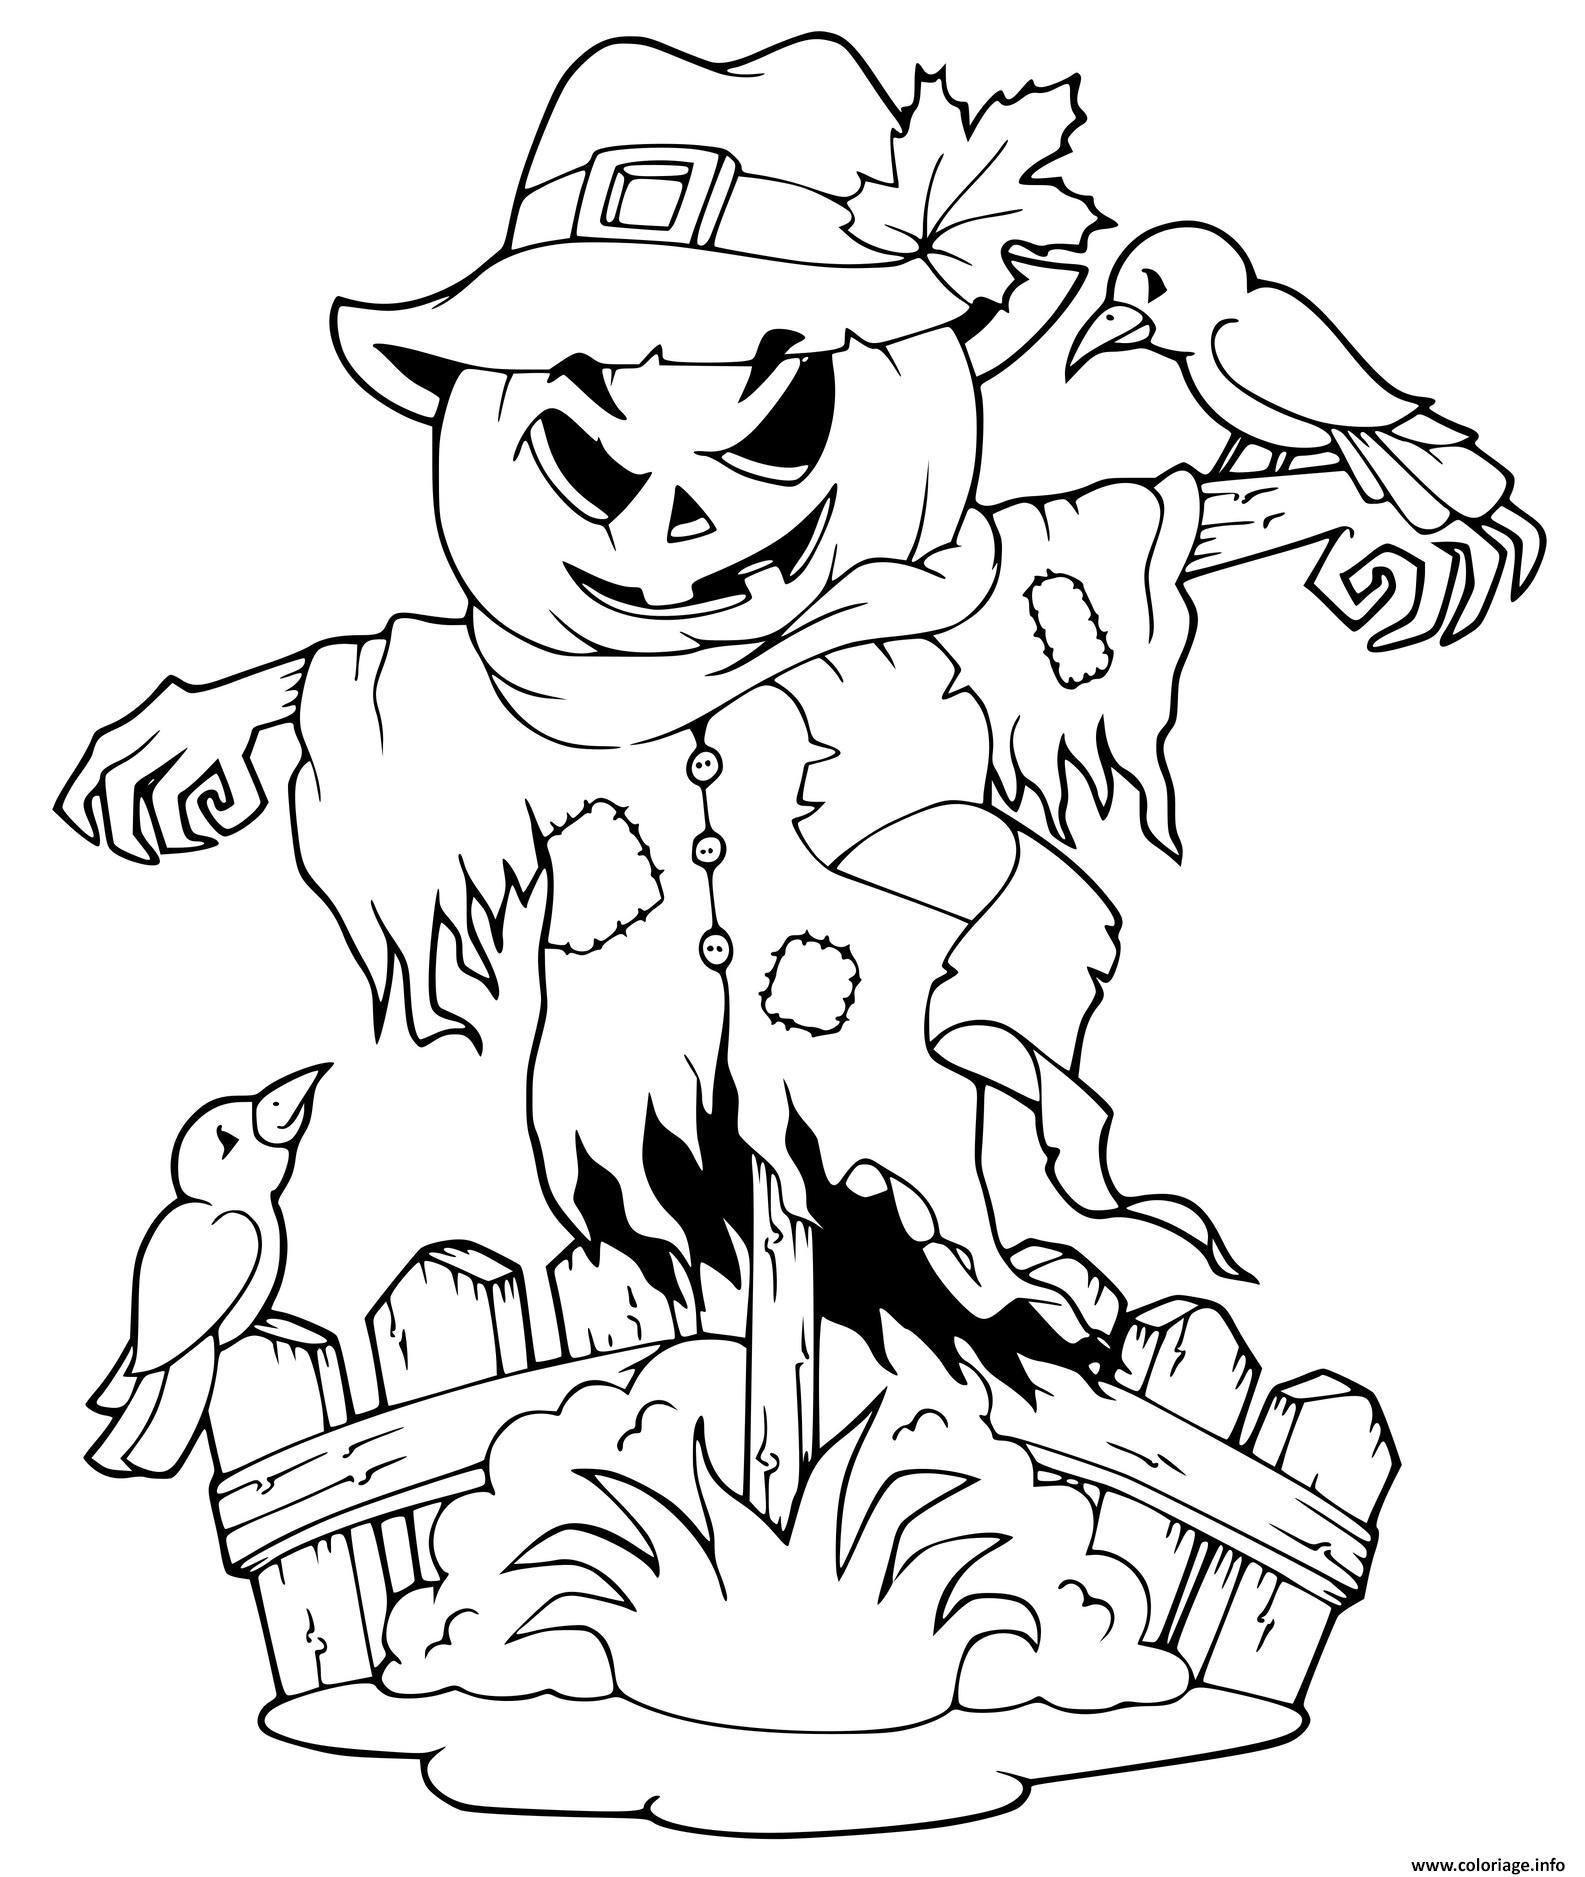 Dessin halloween scarecrow Coloriage Gratuit à Imprimer